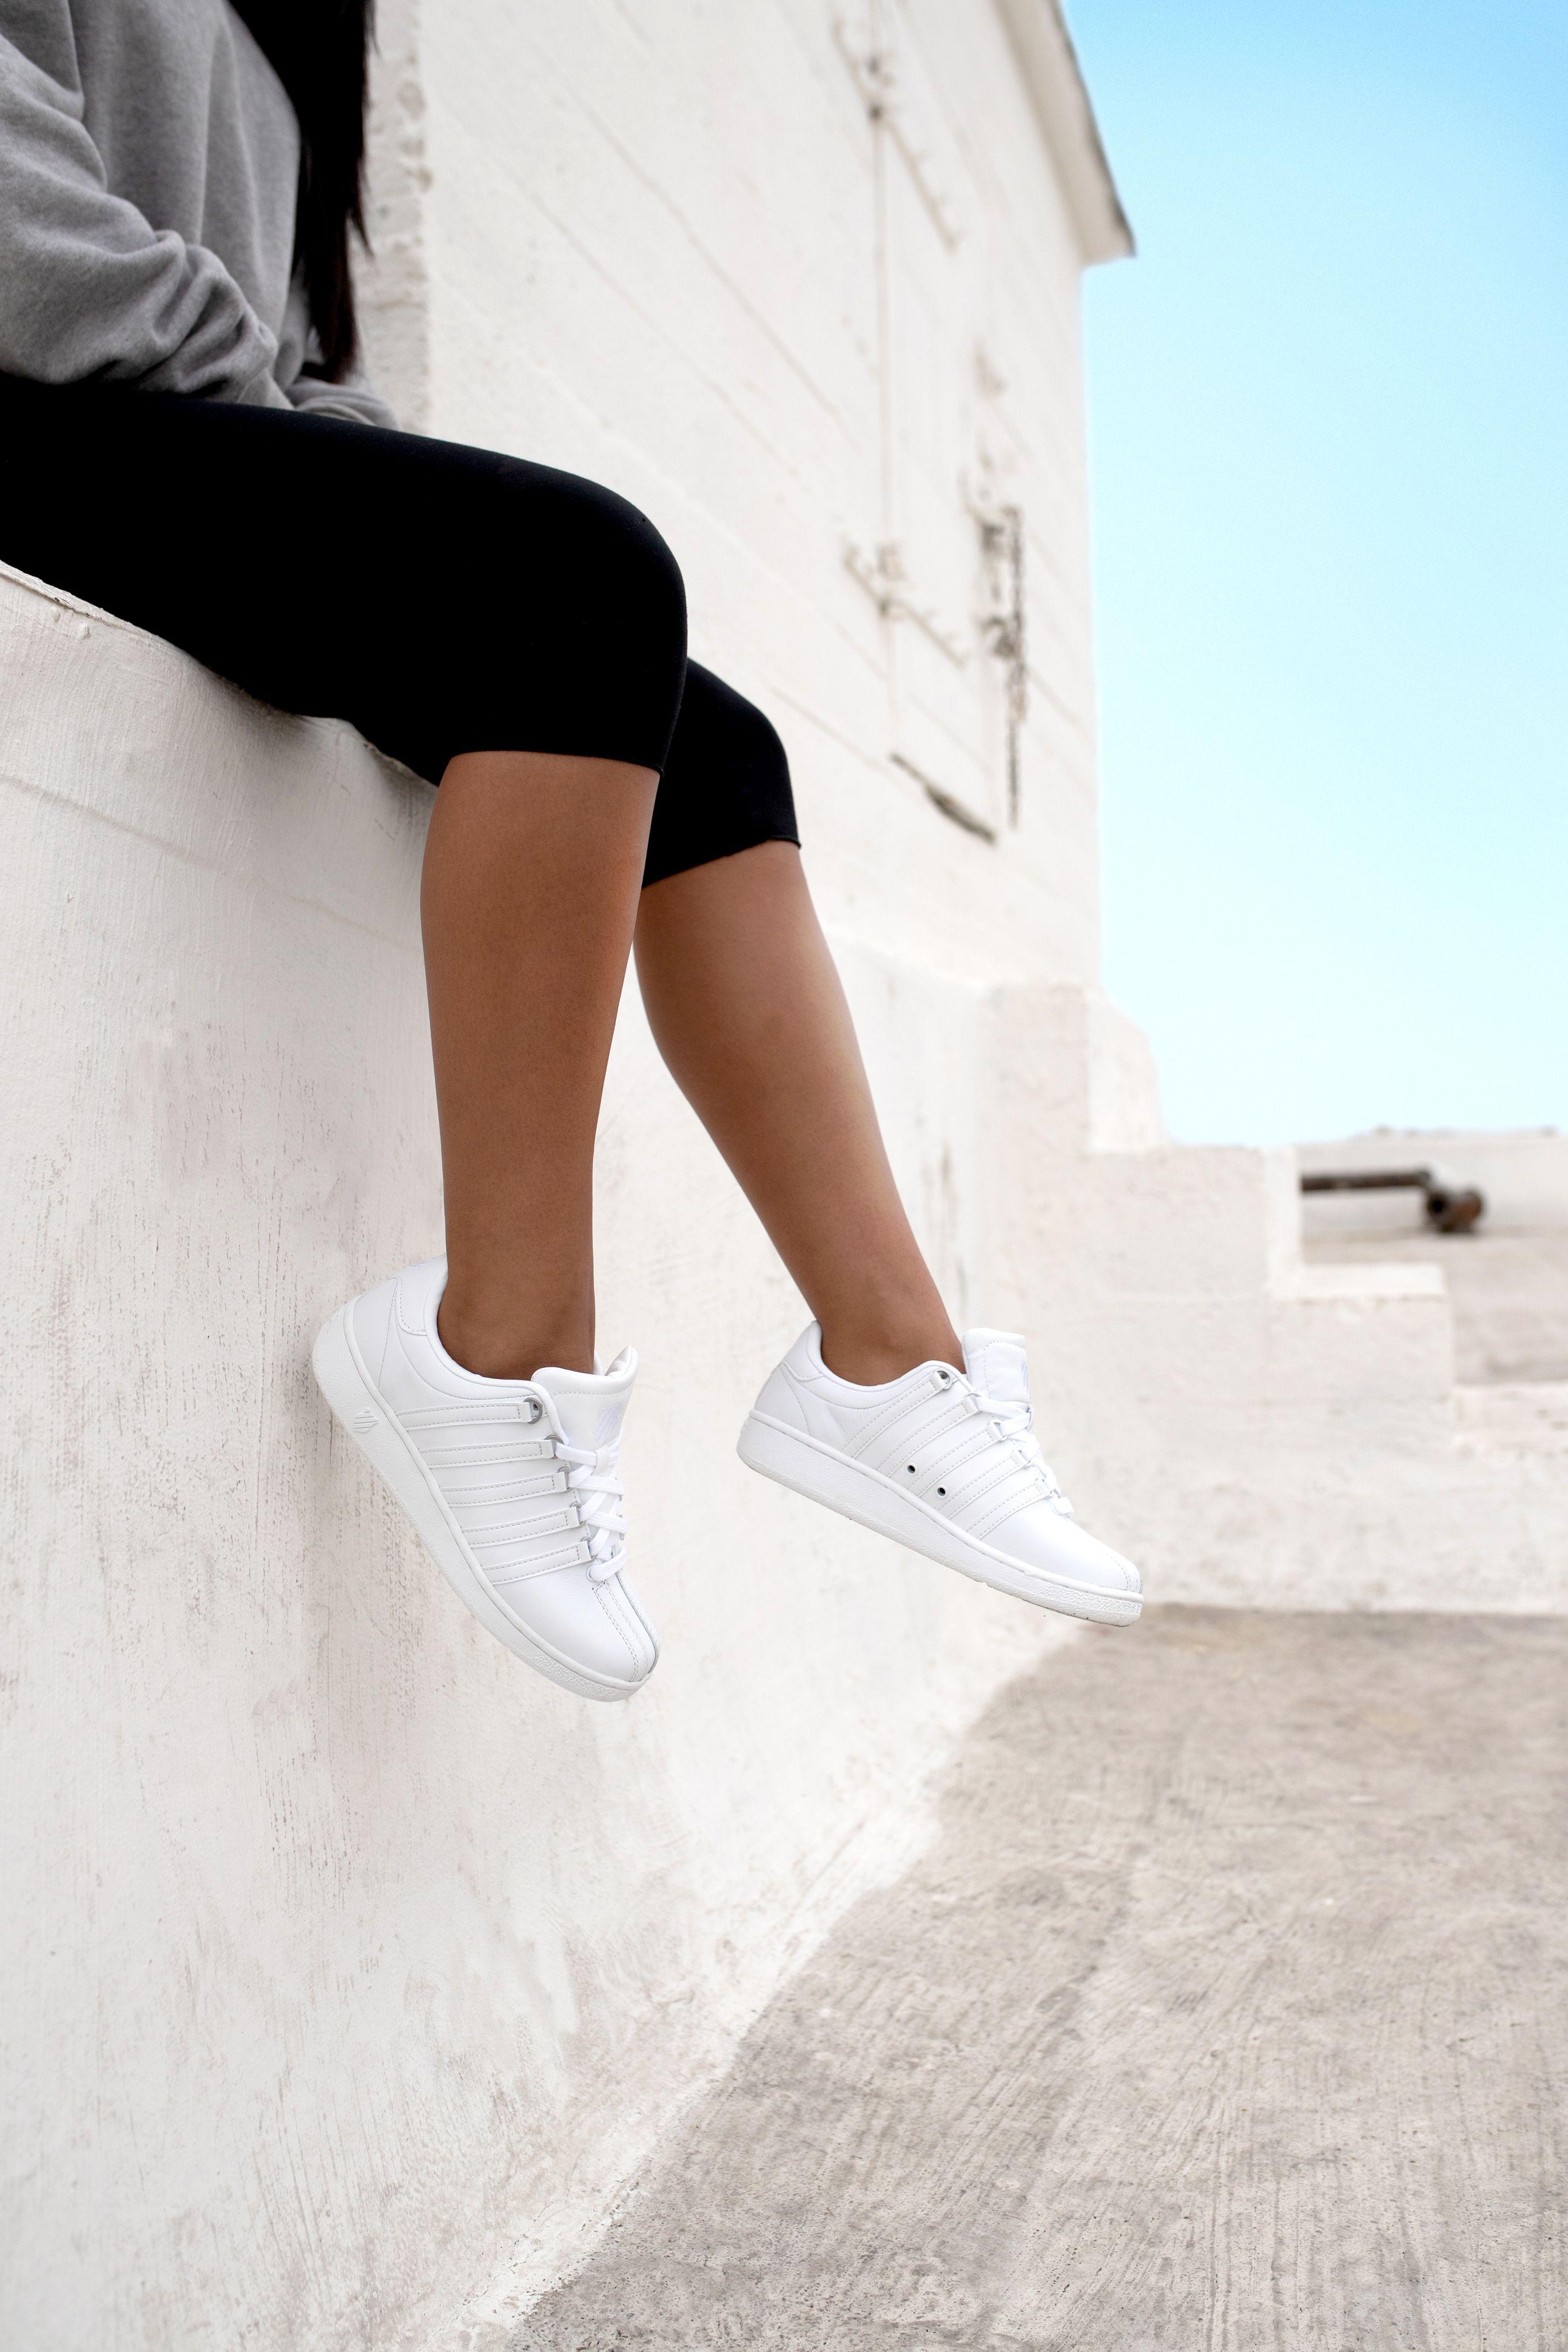 K Swiss Shoes | The Official US Online Shop